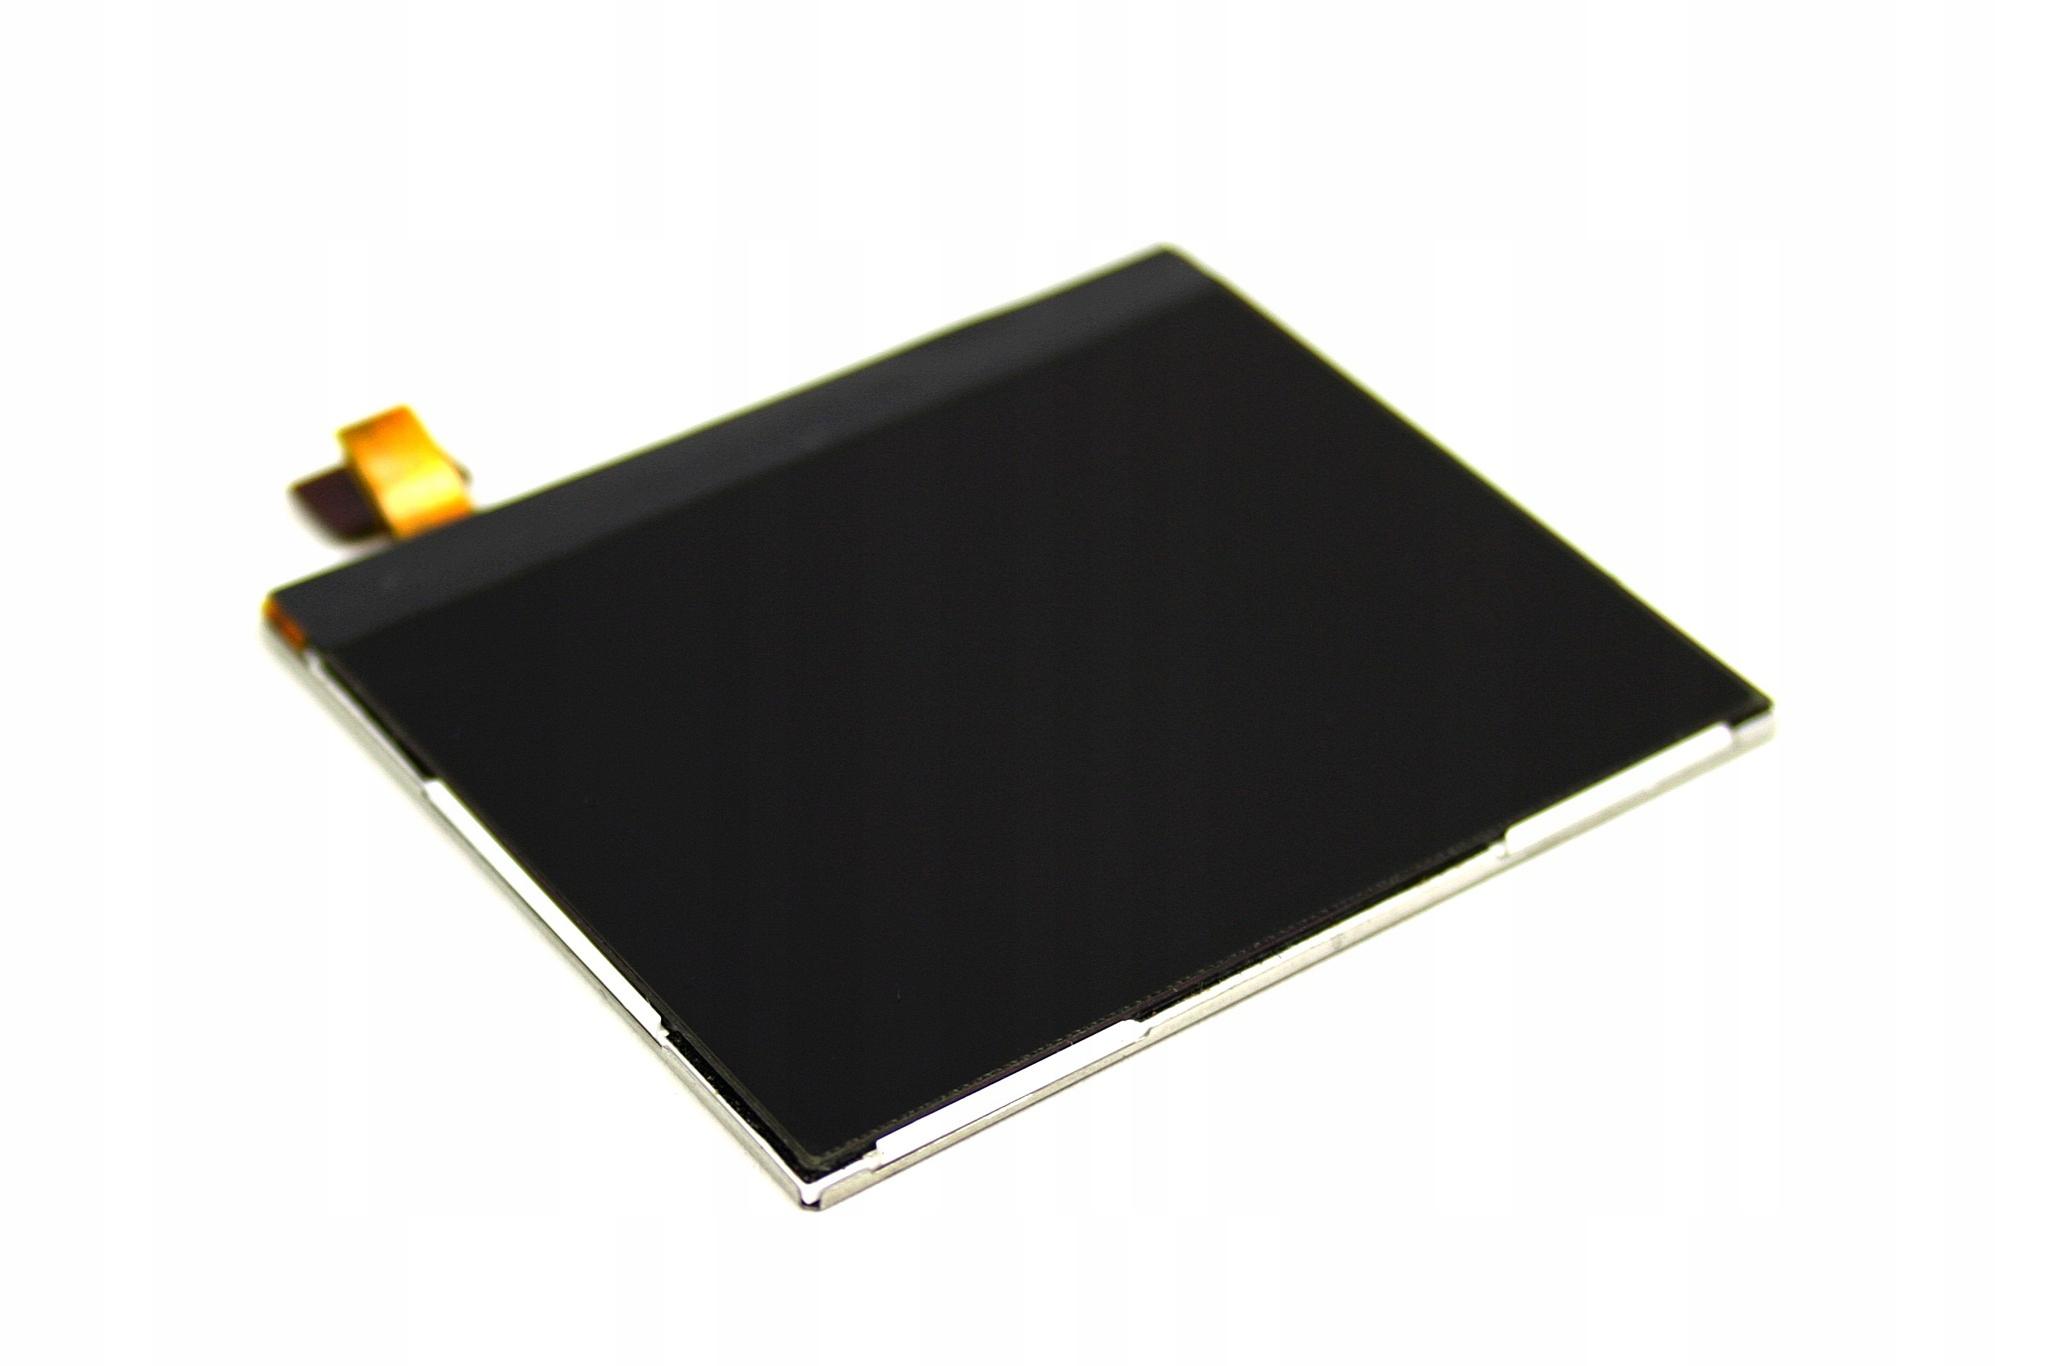 WYŚWIETLACZ PANEL EKRAN LCD NOKIA C3 E5 E71 E72